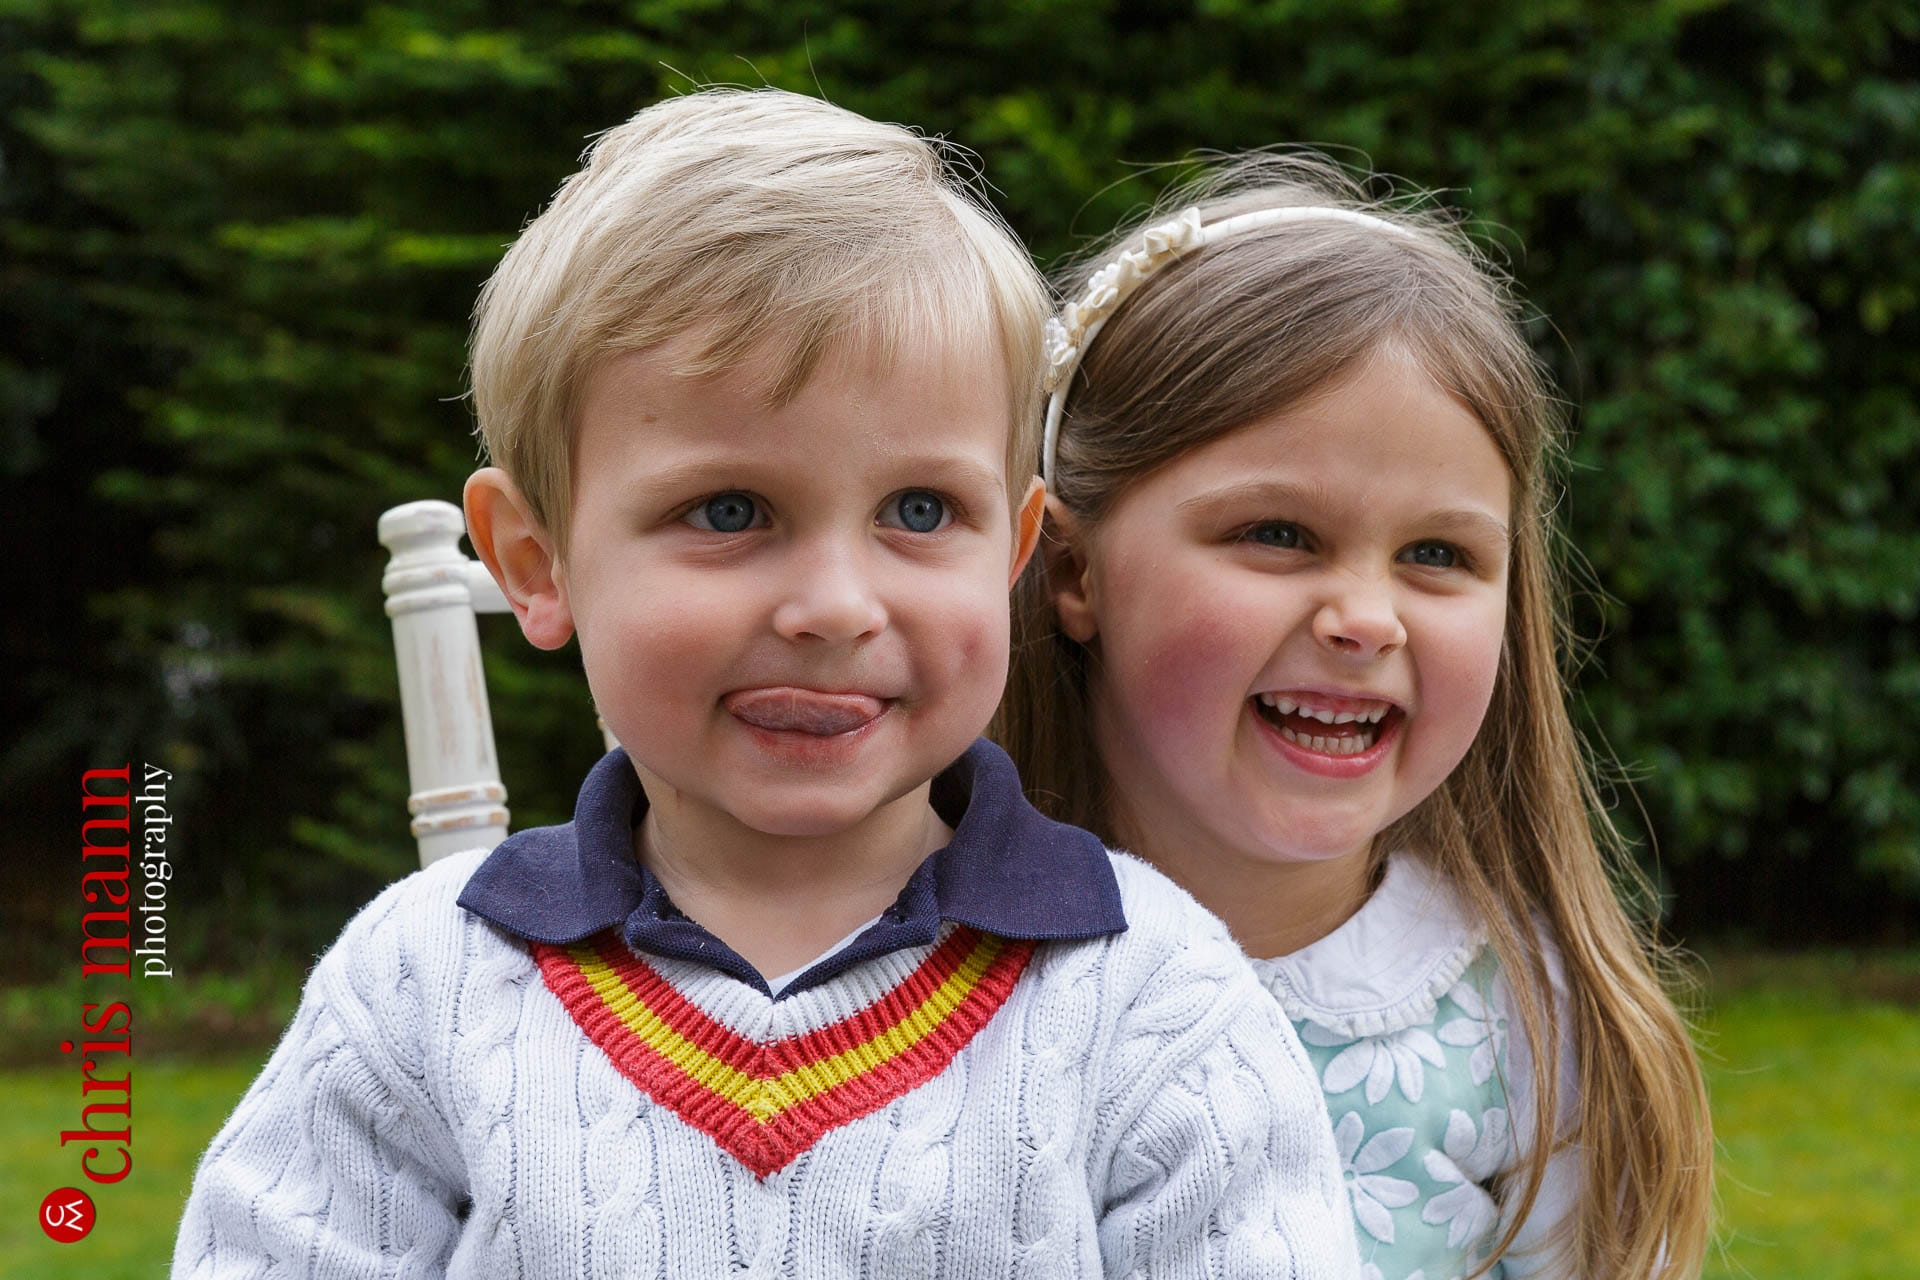 happy children portrait photo